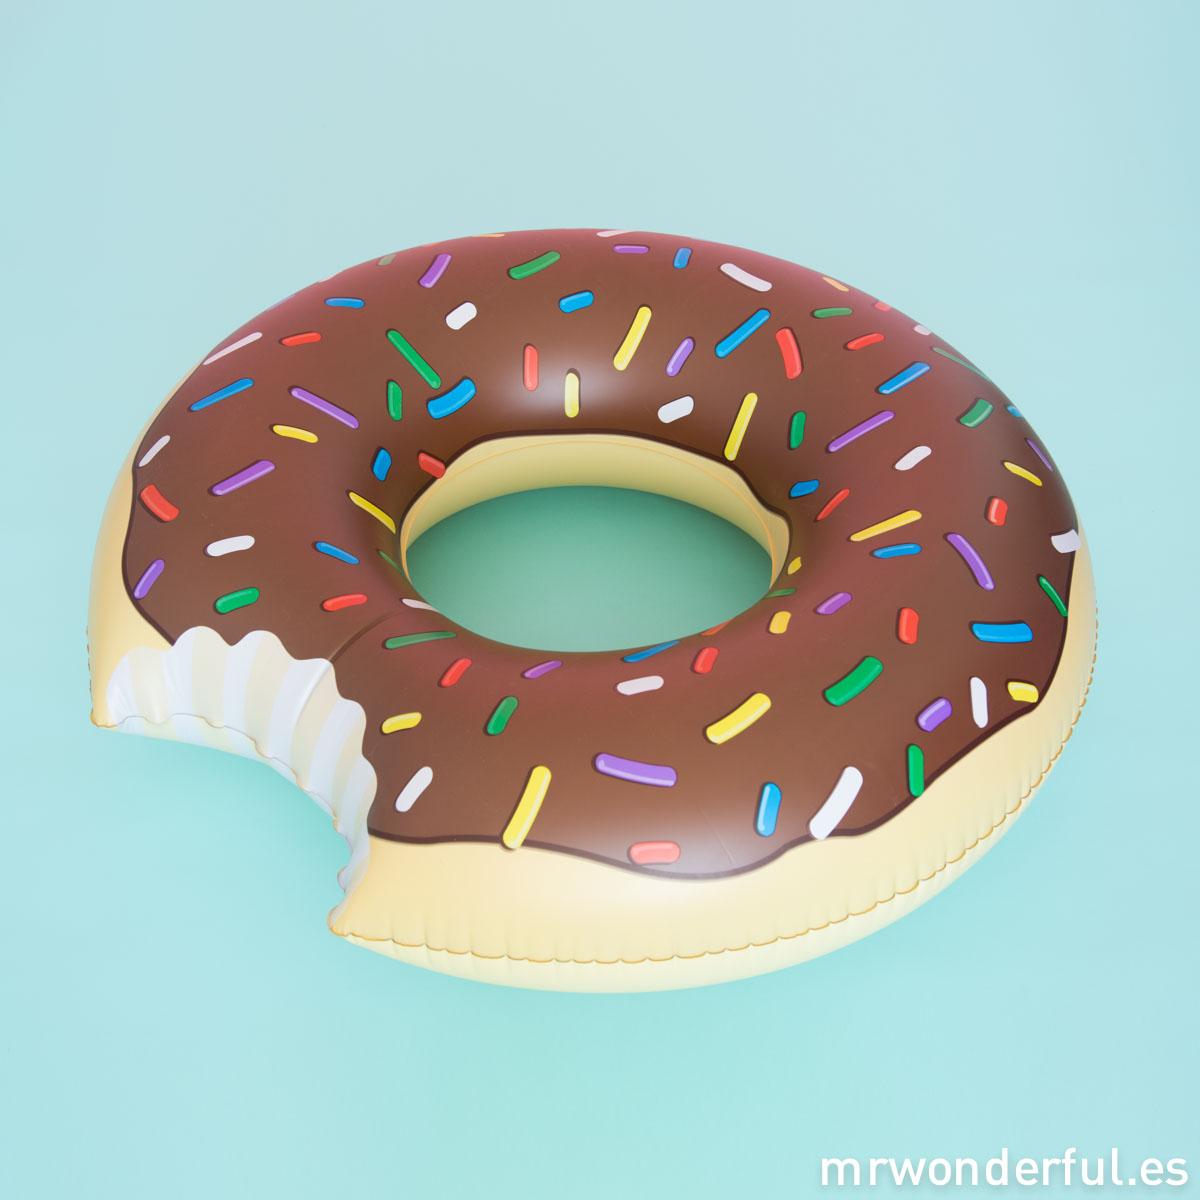 mrwonderful_PRA02918_flotador-hinchable_donut-chocolate-1-Editar